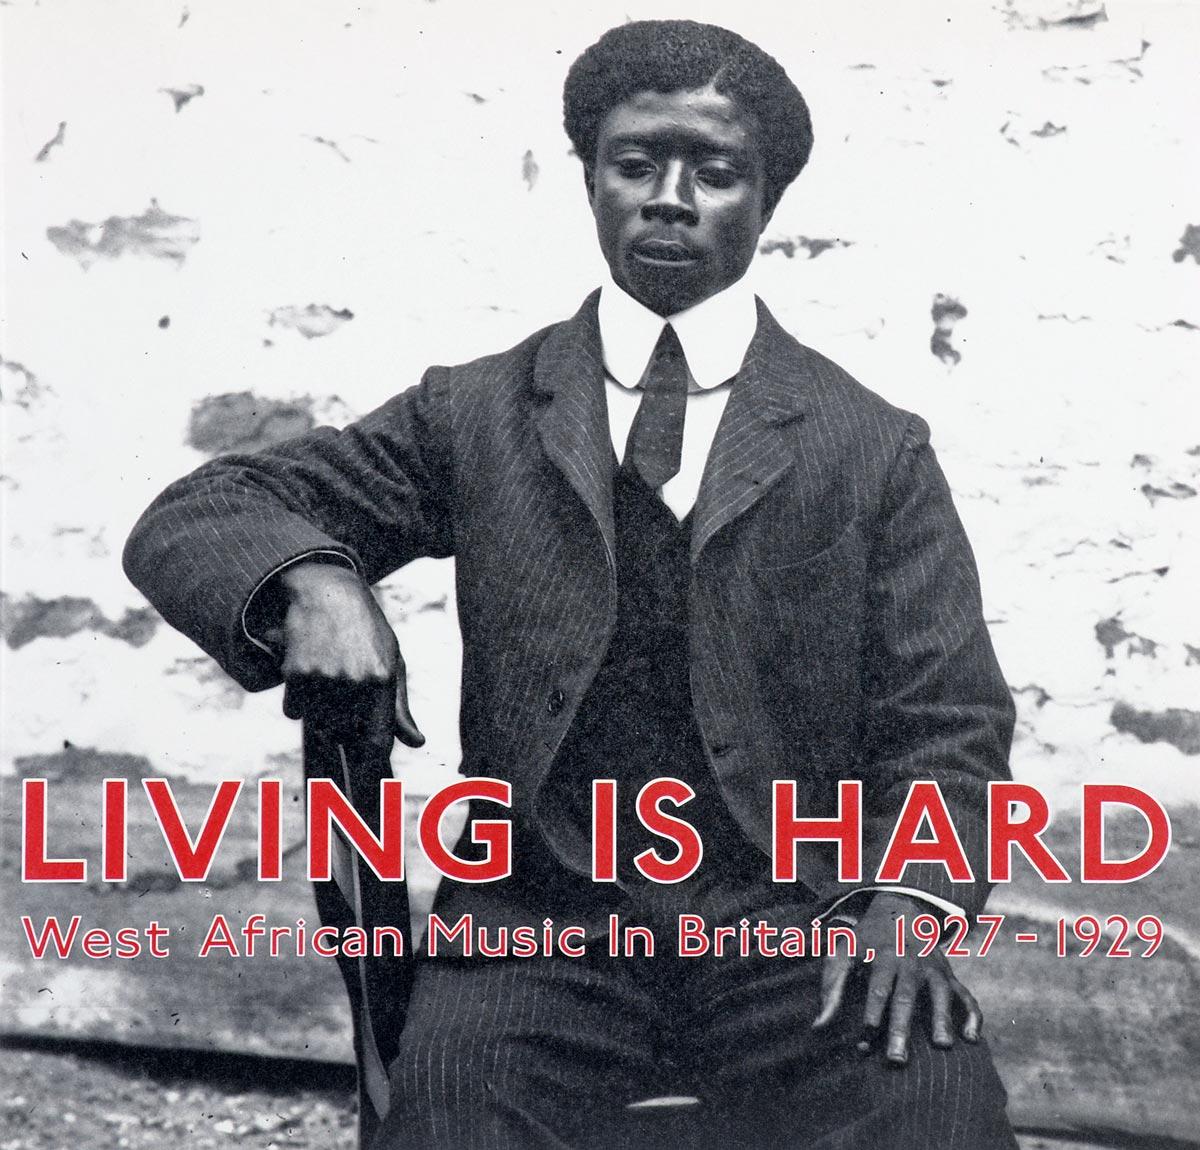 Living Is Hard - West African Music In Britain, 1927-1929 (2 LP) honest steel butane lighter